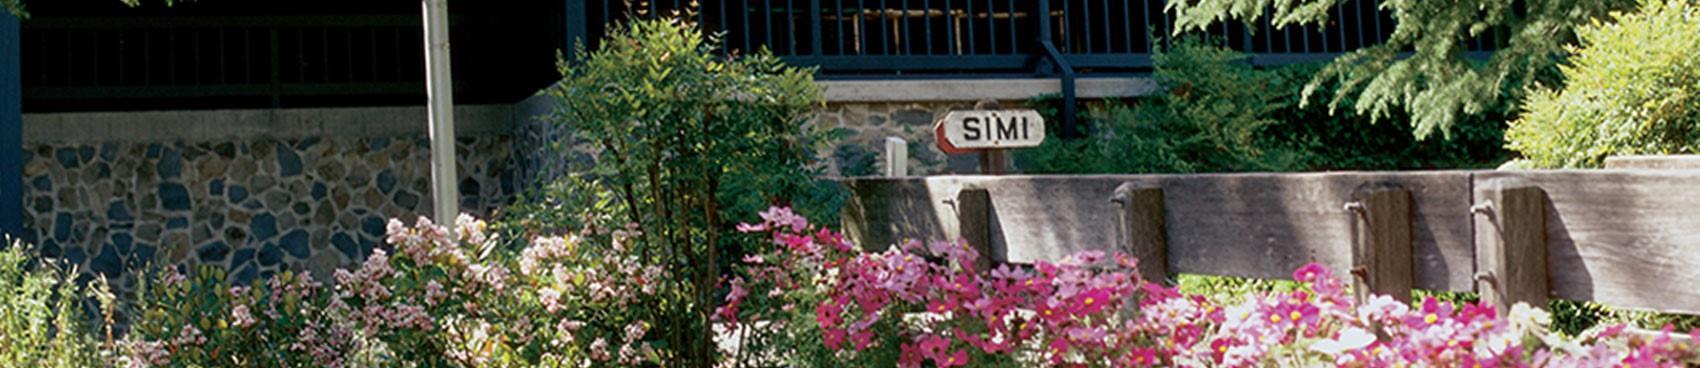 Making Sauerkraut - pairing with Simi Russian River Pinot Gris